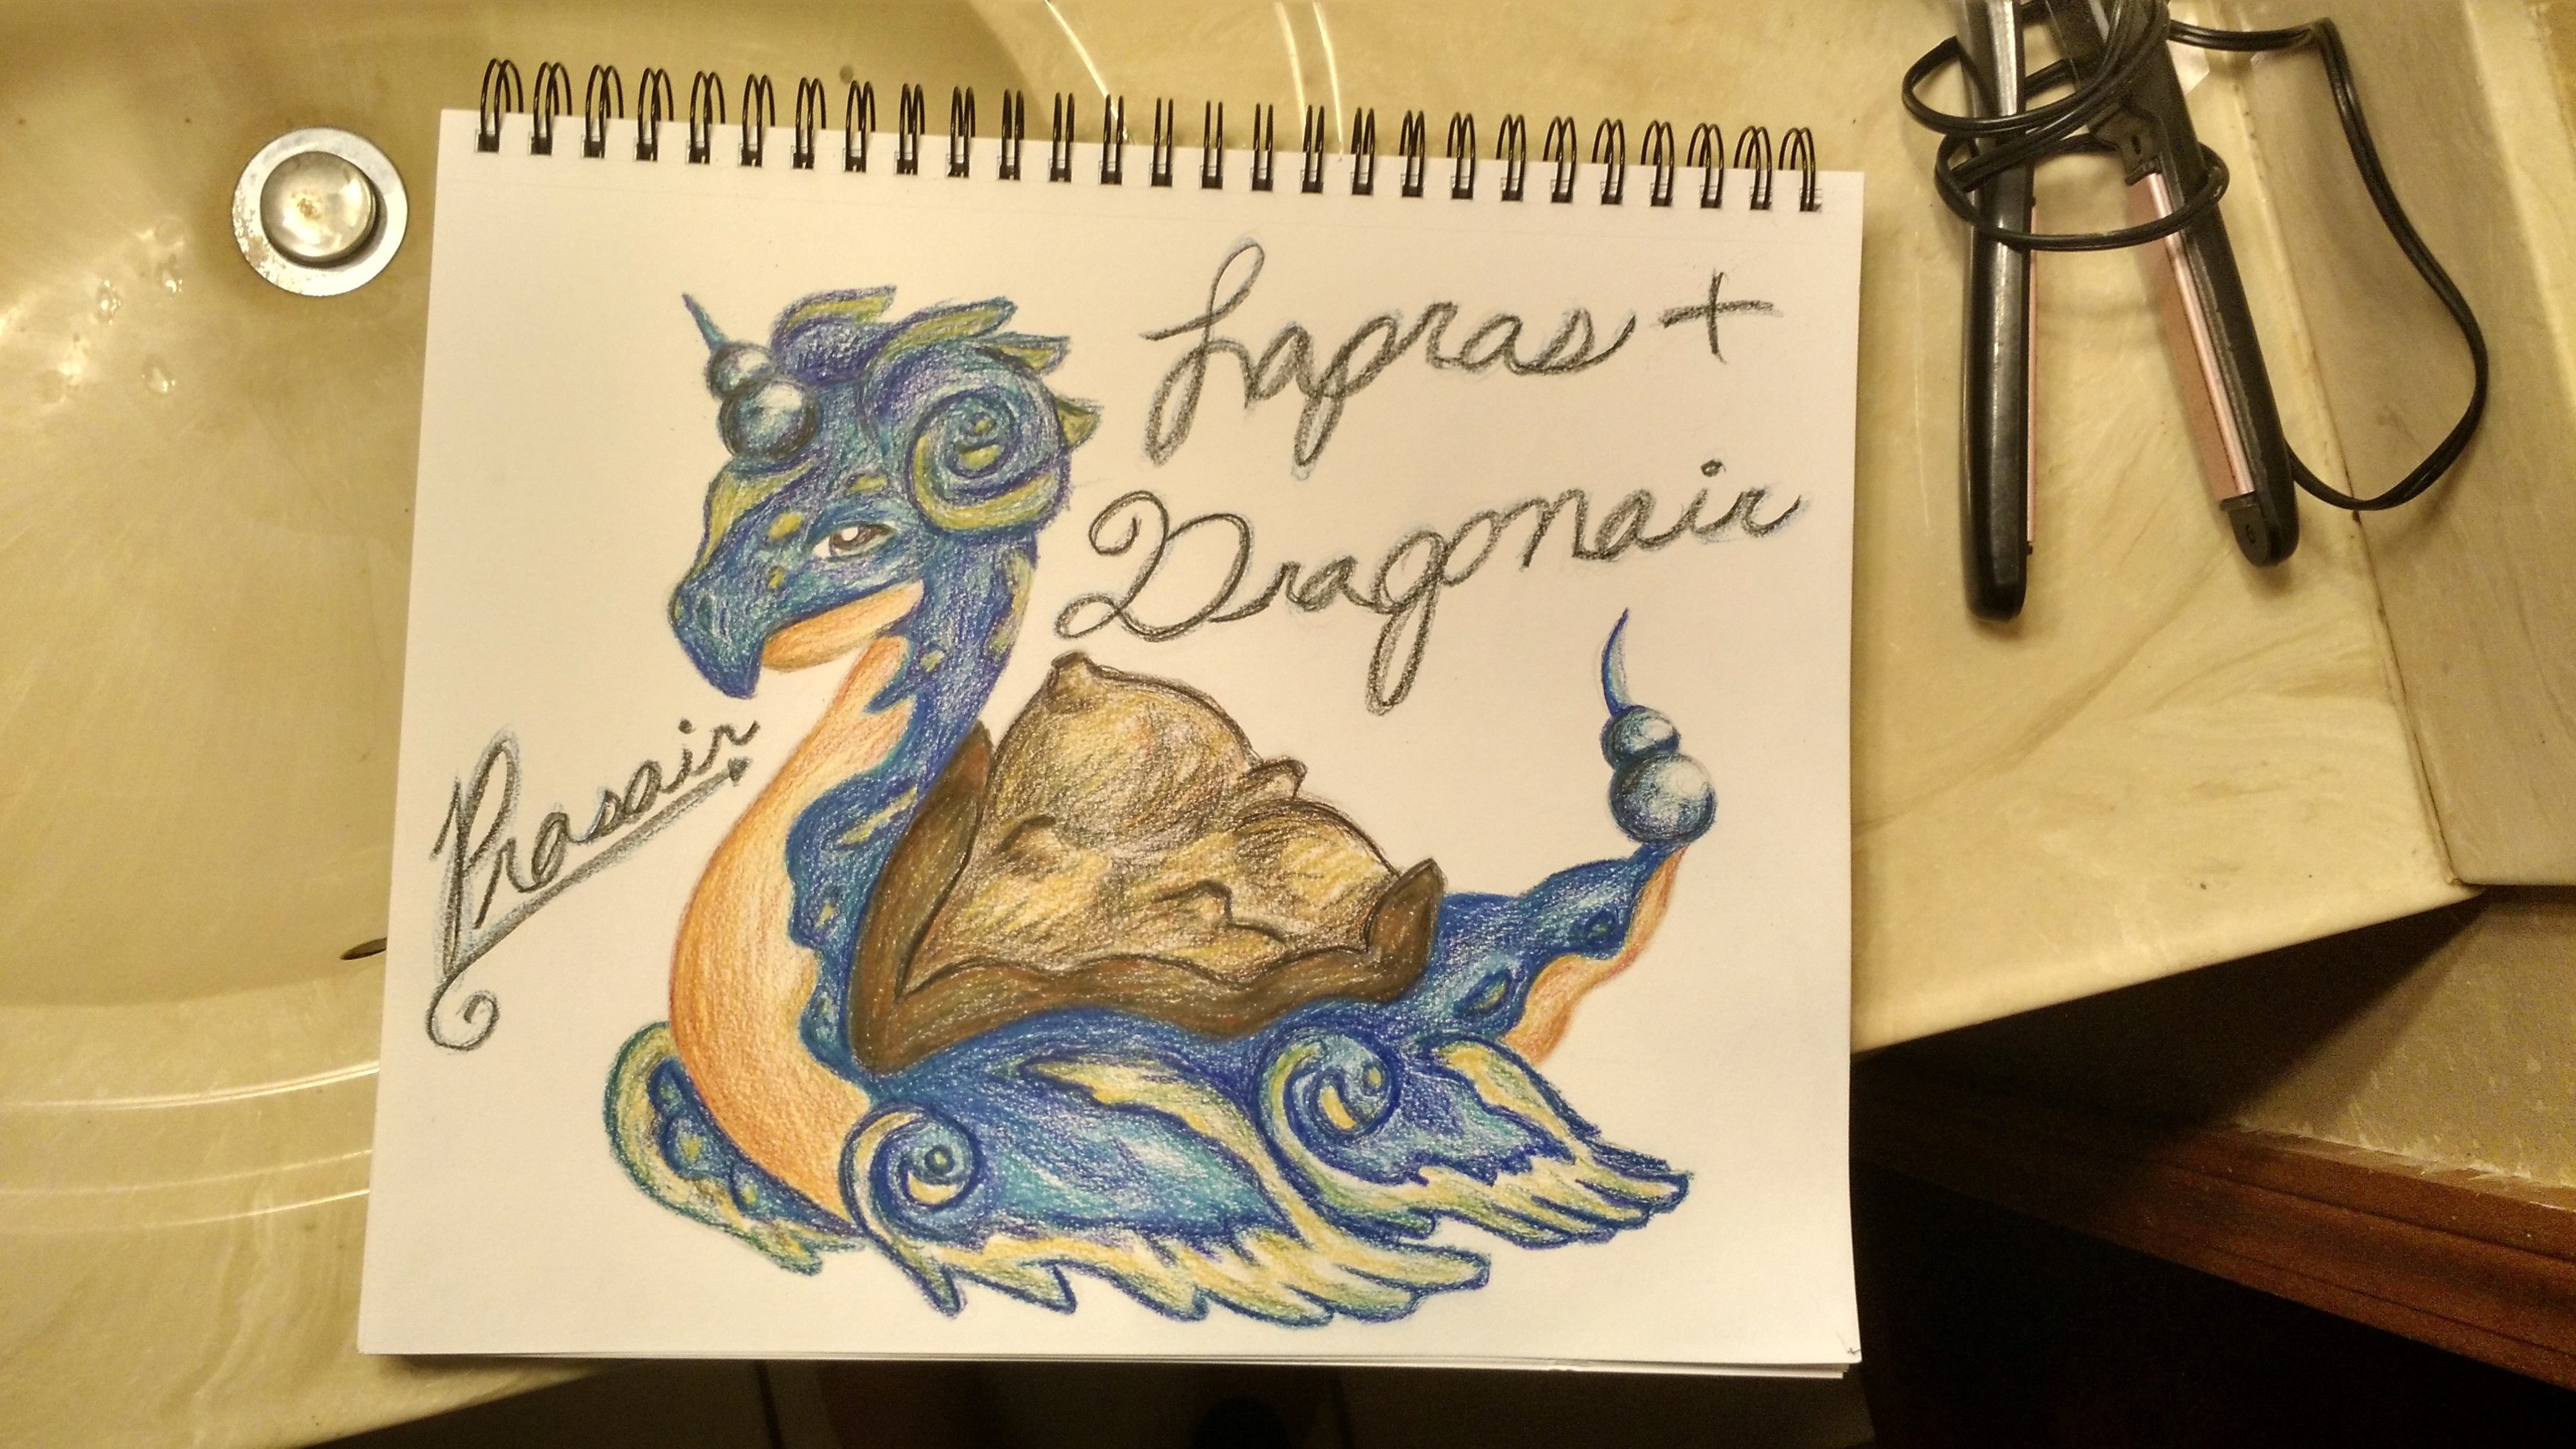 Lapras+Dragonair Mashup